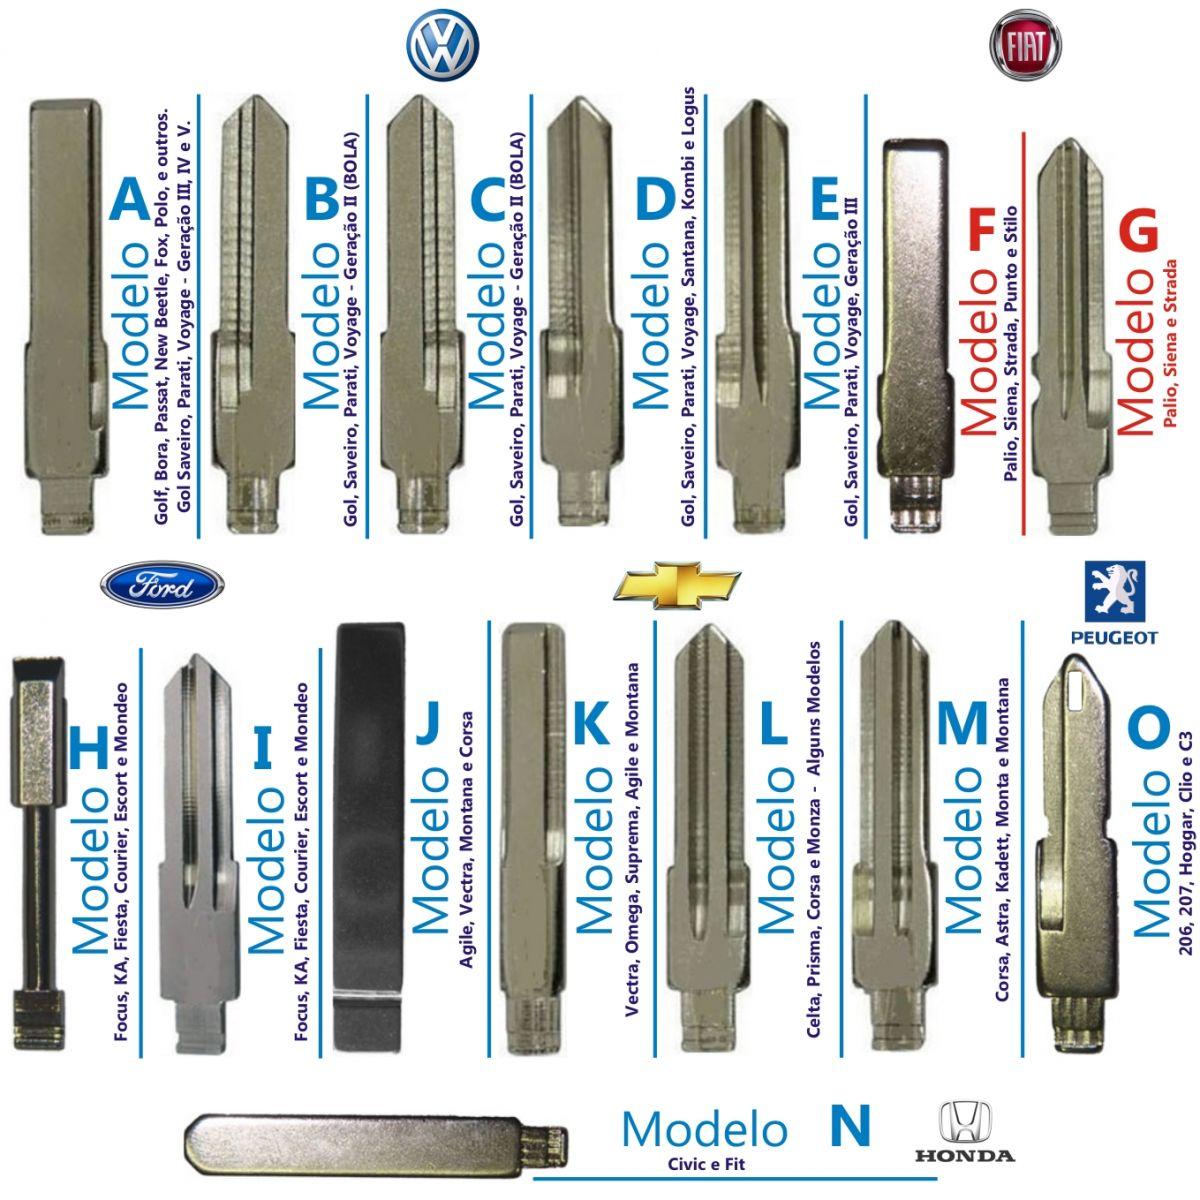 Chave Canivete Cromada + Placa Alarme Positron + Lamina Chevrolet GM VW Fiat Ford Peugeot Renault